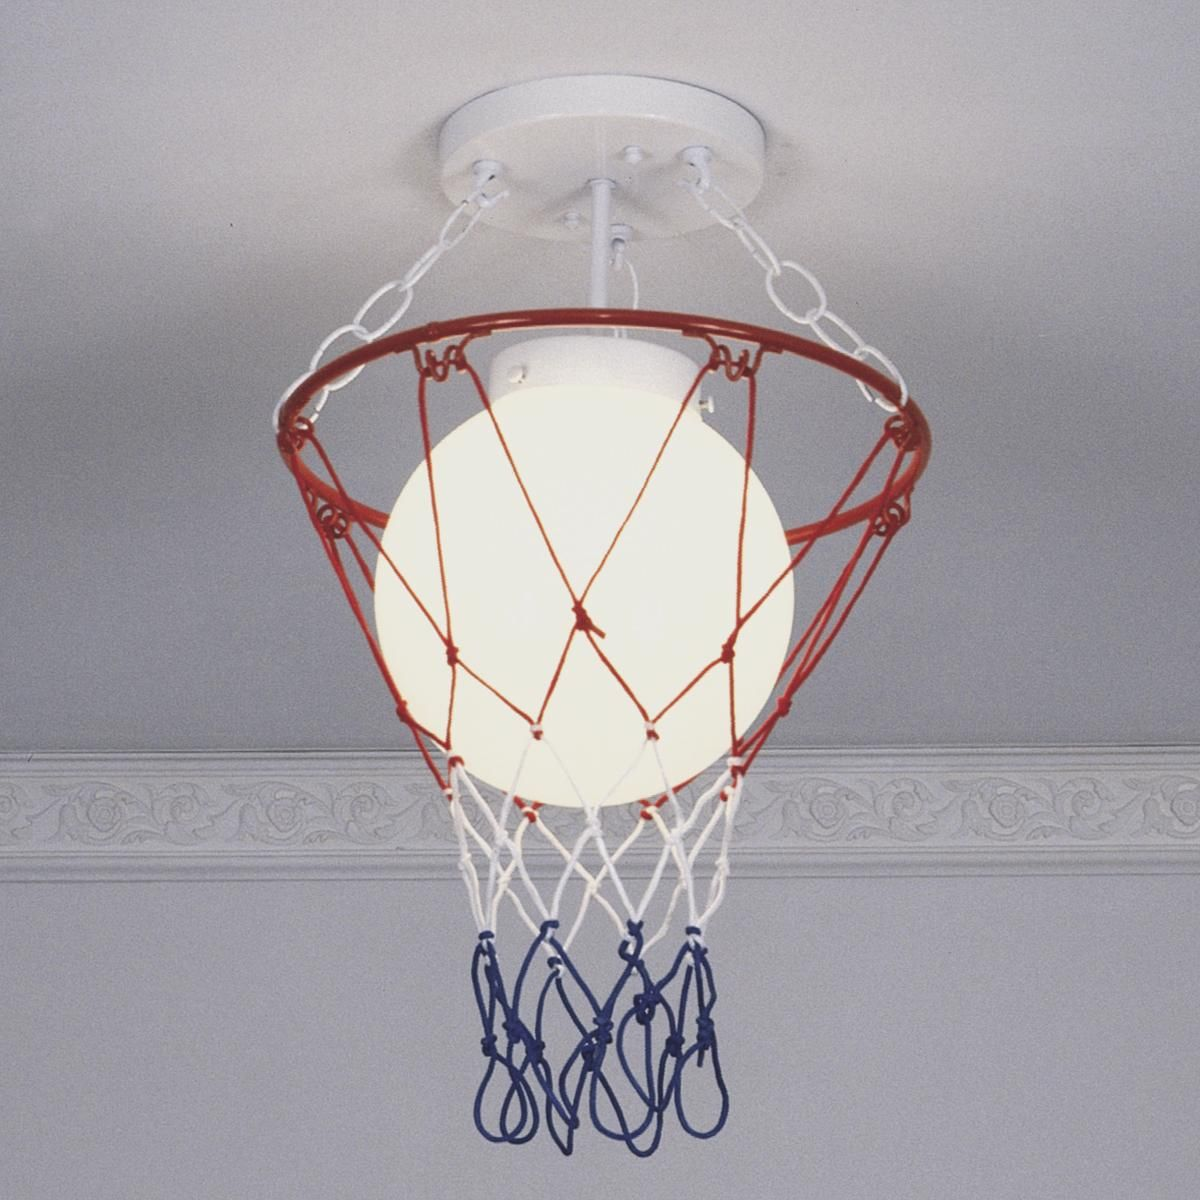 Basketball and Net Ceiling Light | Basketball | Basketball ...